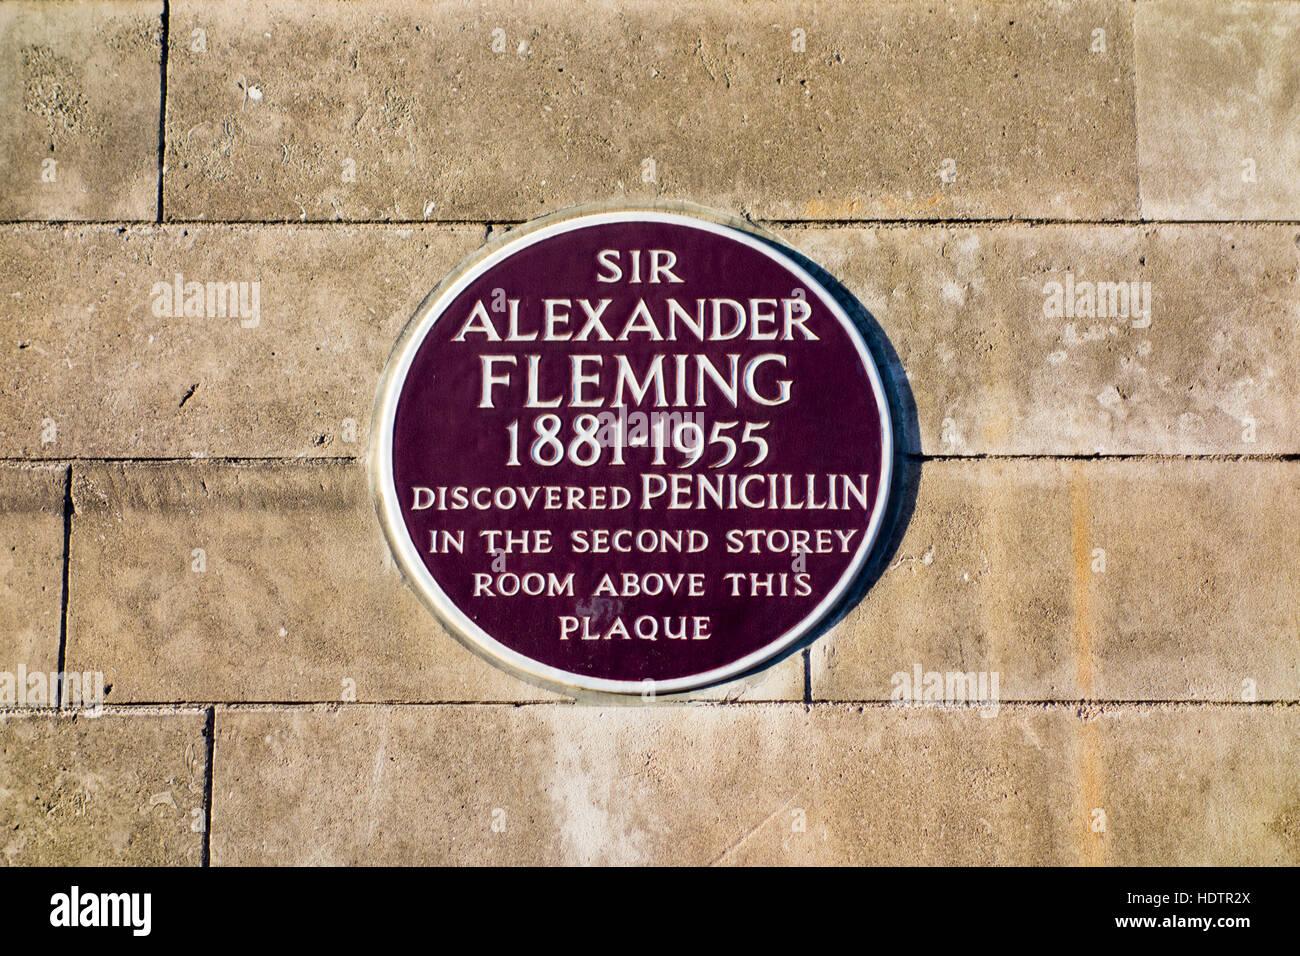 Plaque showing the site Alexander Fleming discovered penicillin. Praed Street, London, UK - Stock Image